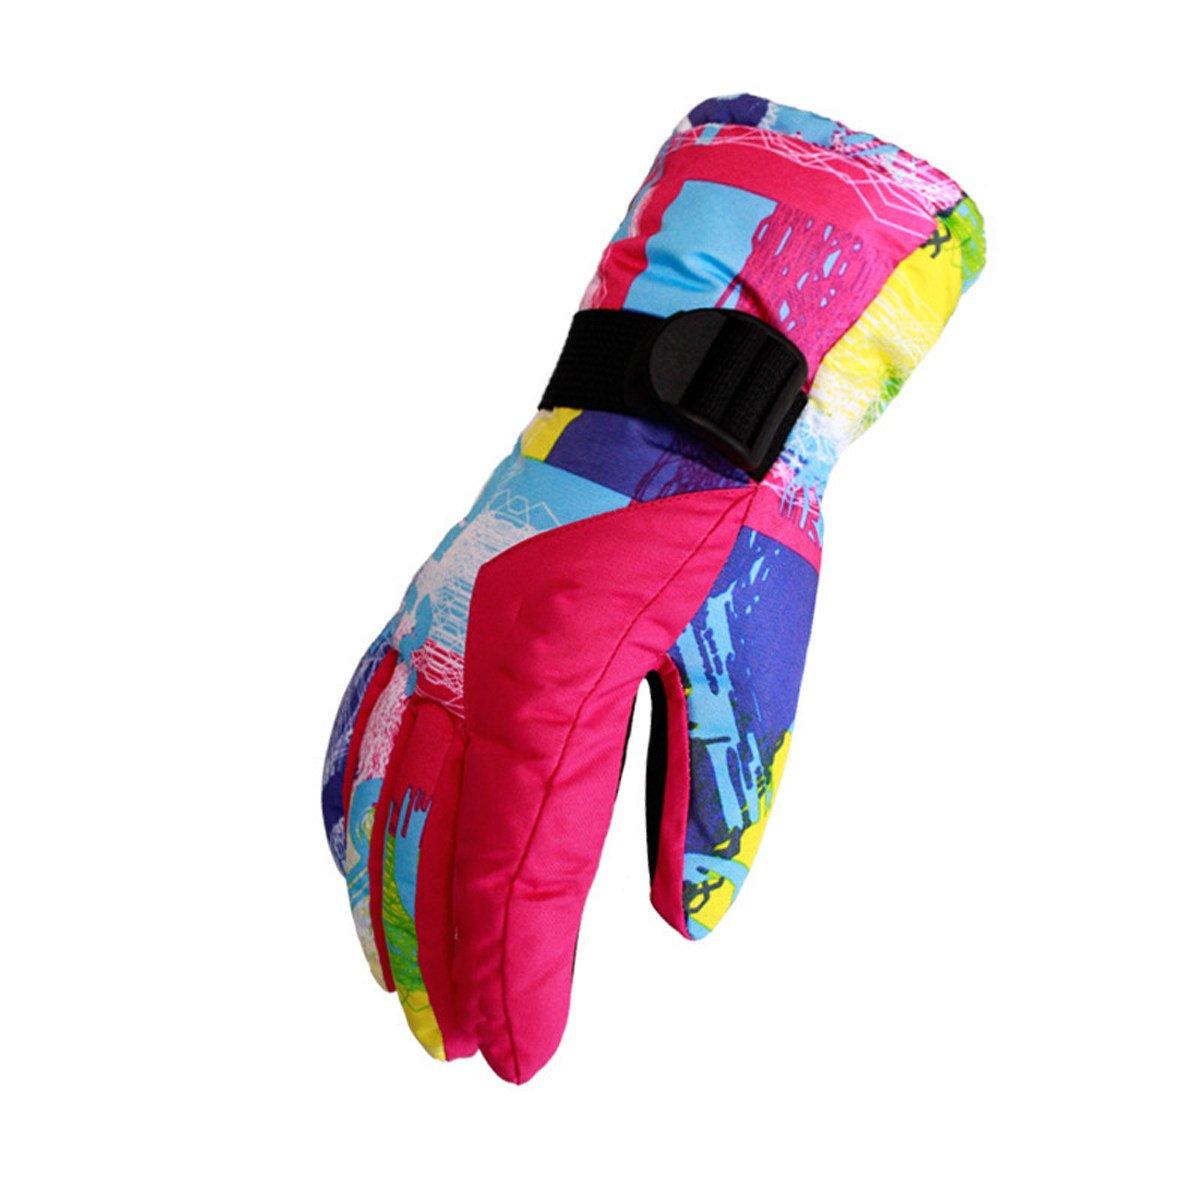 Outdoor Skifahren Handschuhe Mann Frau Wind Warm Reiten Handschuhe,RoseROT-L